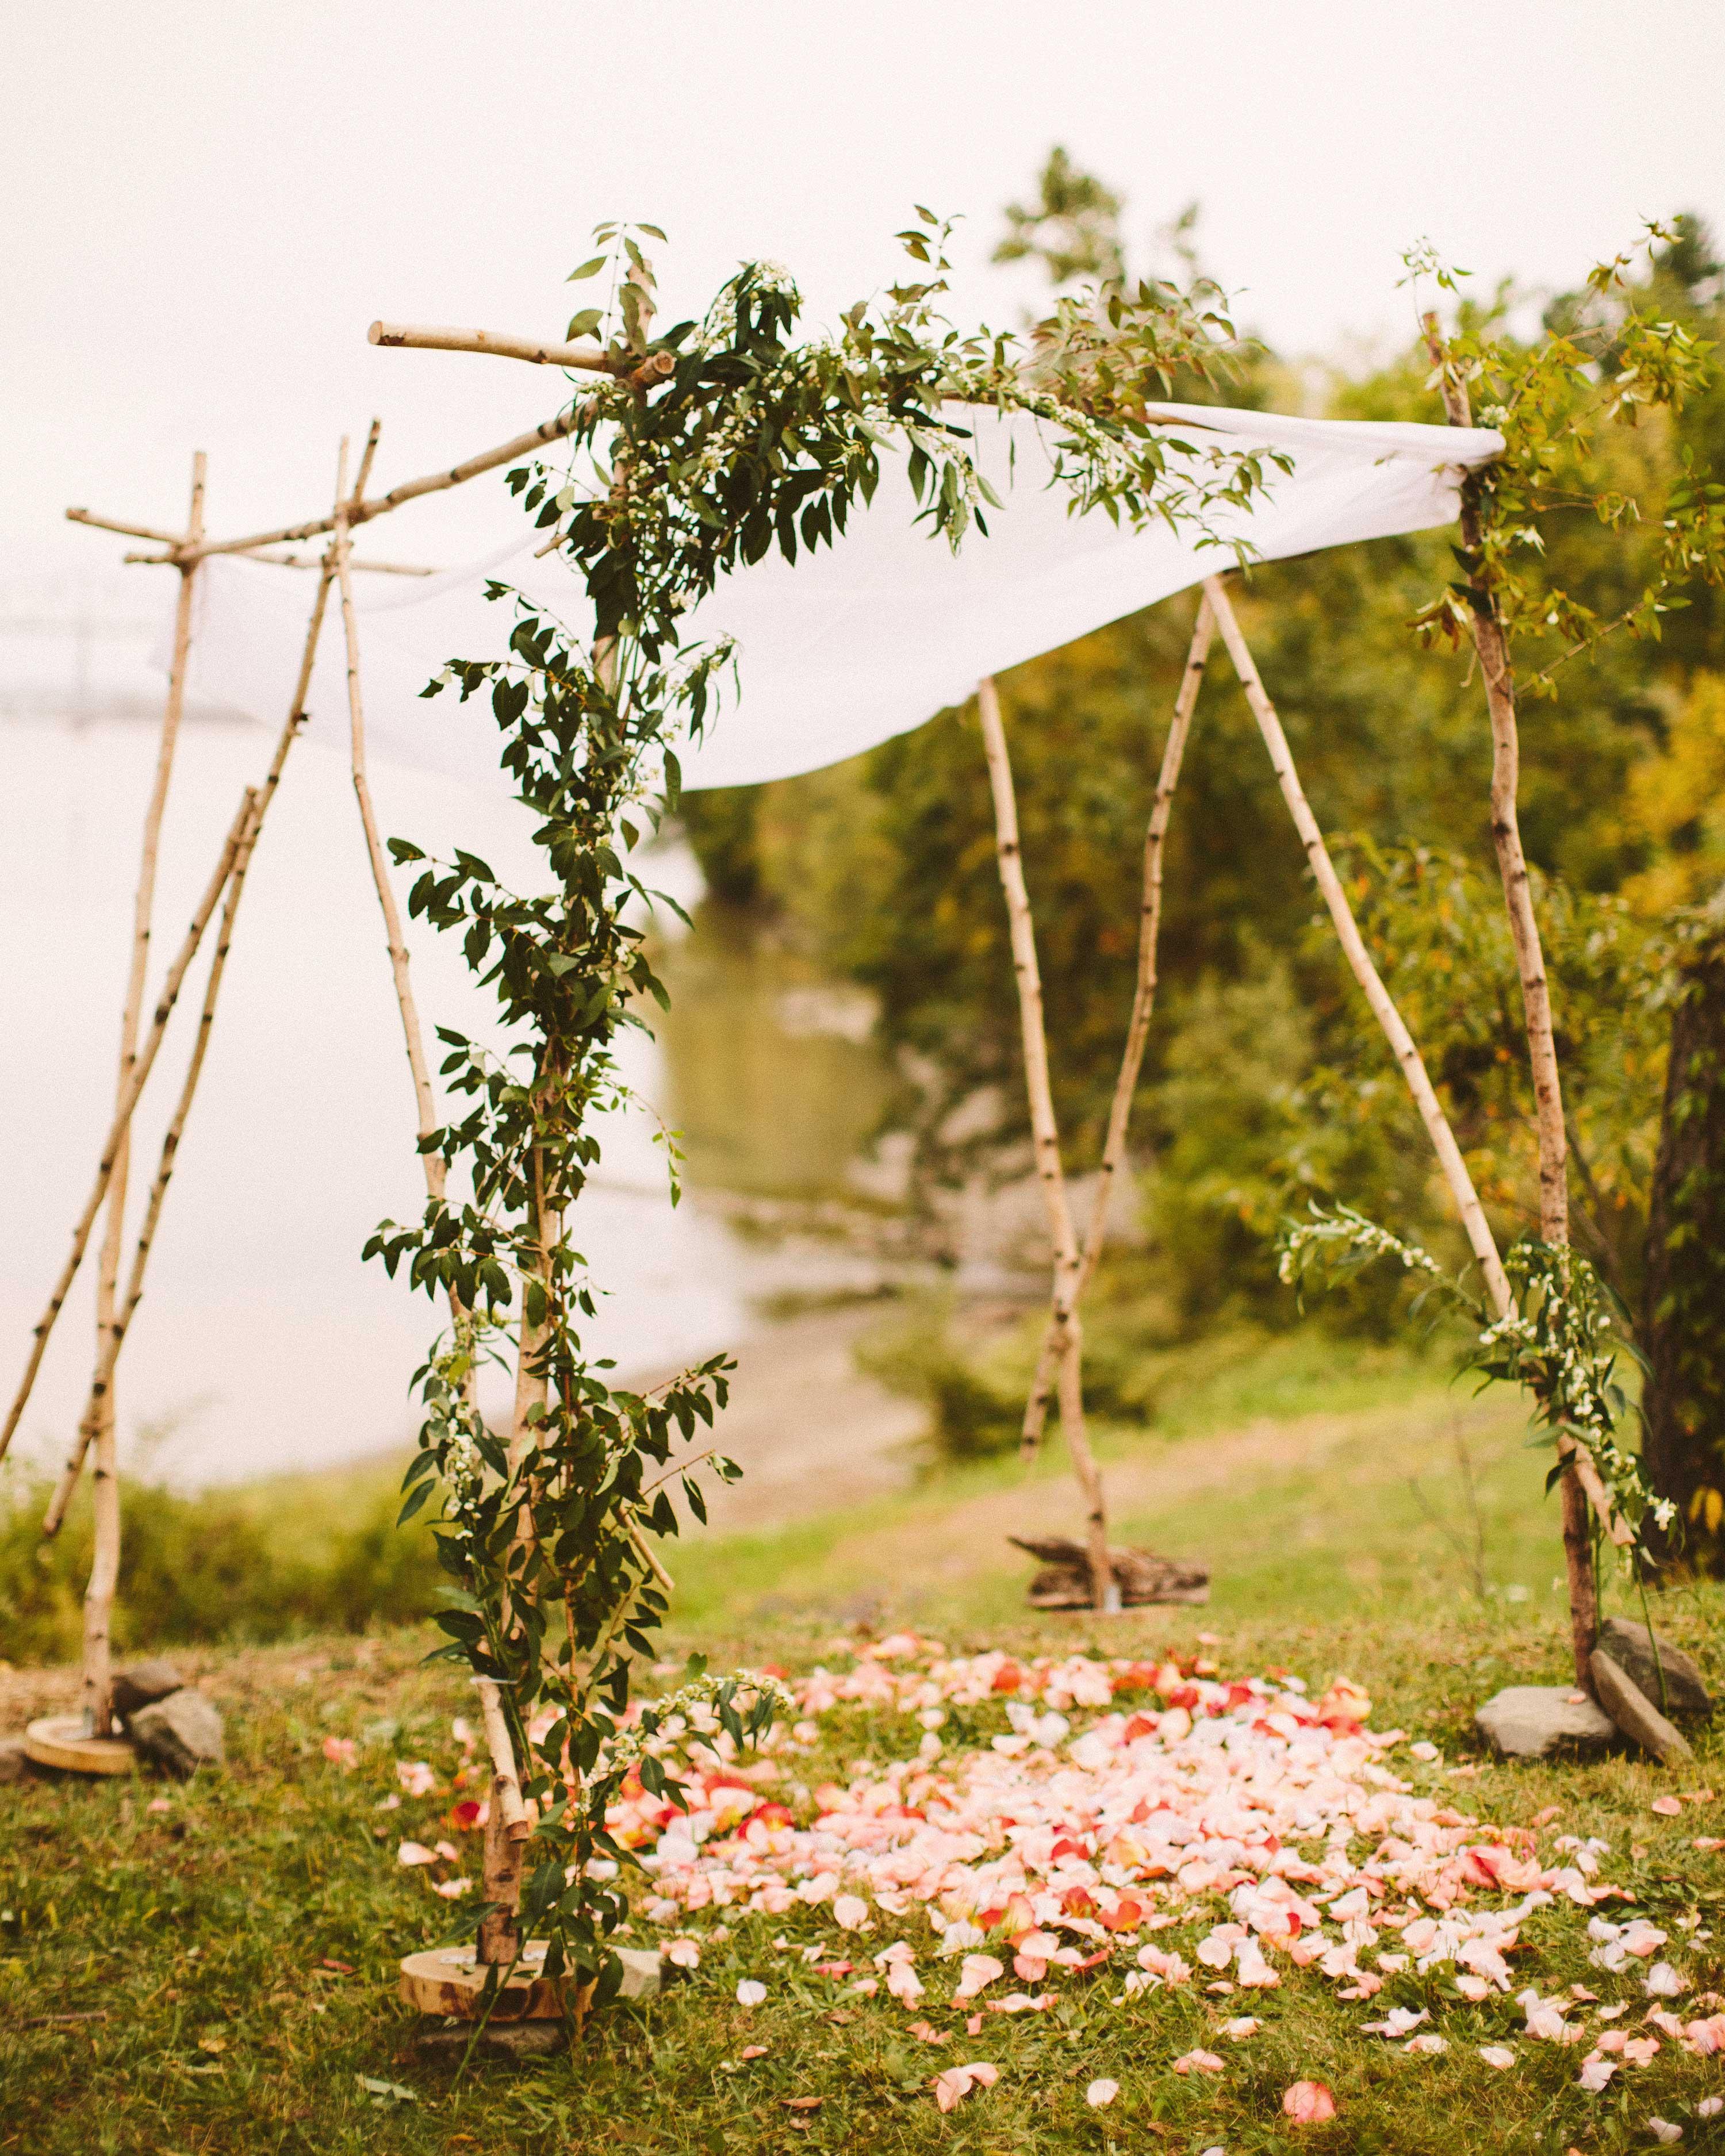 alisa-barrett-wedding-chuppah-986-s113048-0716.jpg